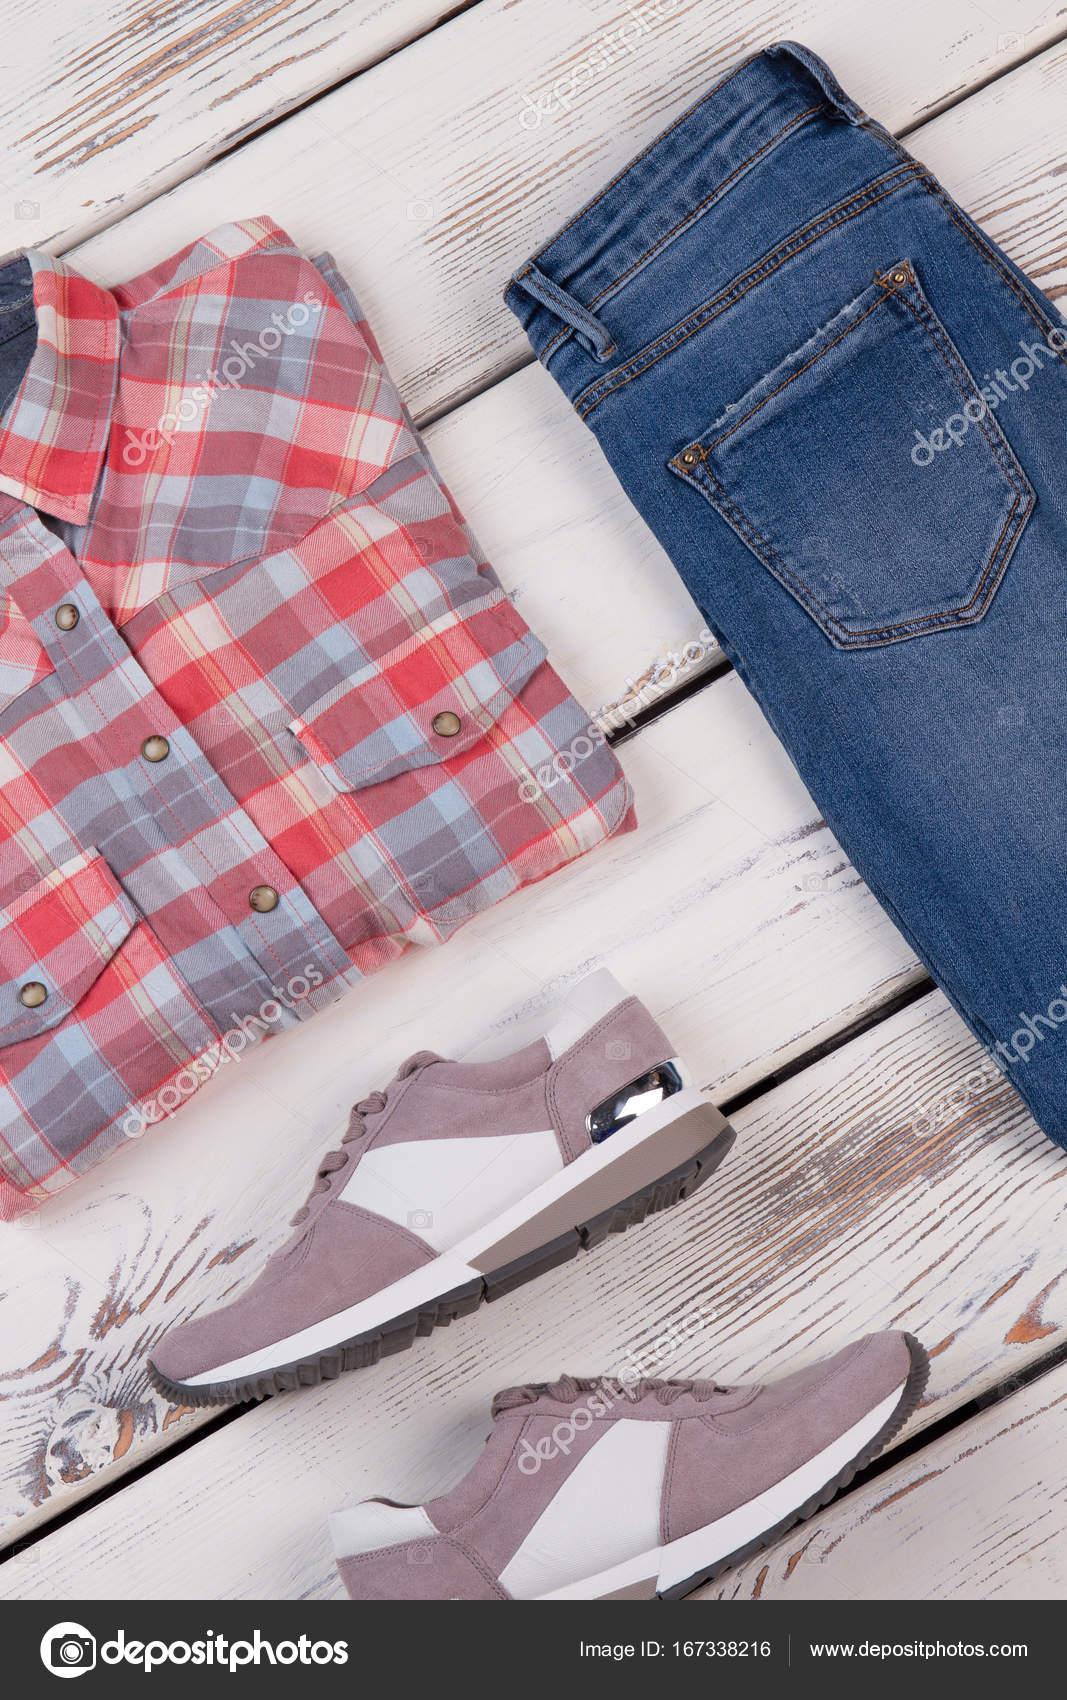 737df3cb5107 Κολάζ από μοντέρνα γυναικεία ρούχα σε παλιό ξύλινο υπόβαθρο. Καρό πουκάμισο  σε συνδυασμό με τζιν και αθλητικά παπούτσια — Εικόνα από margostock